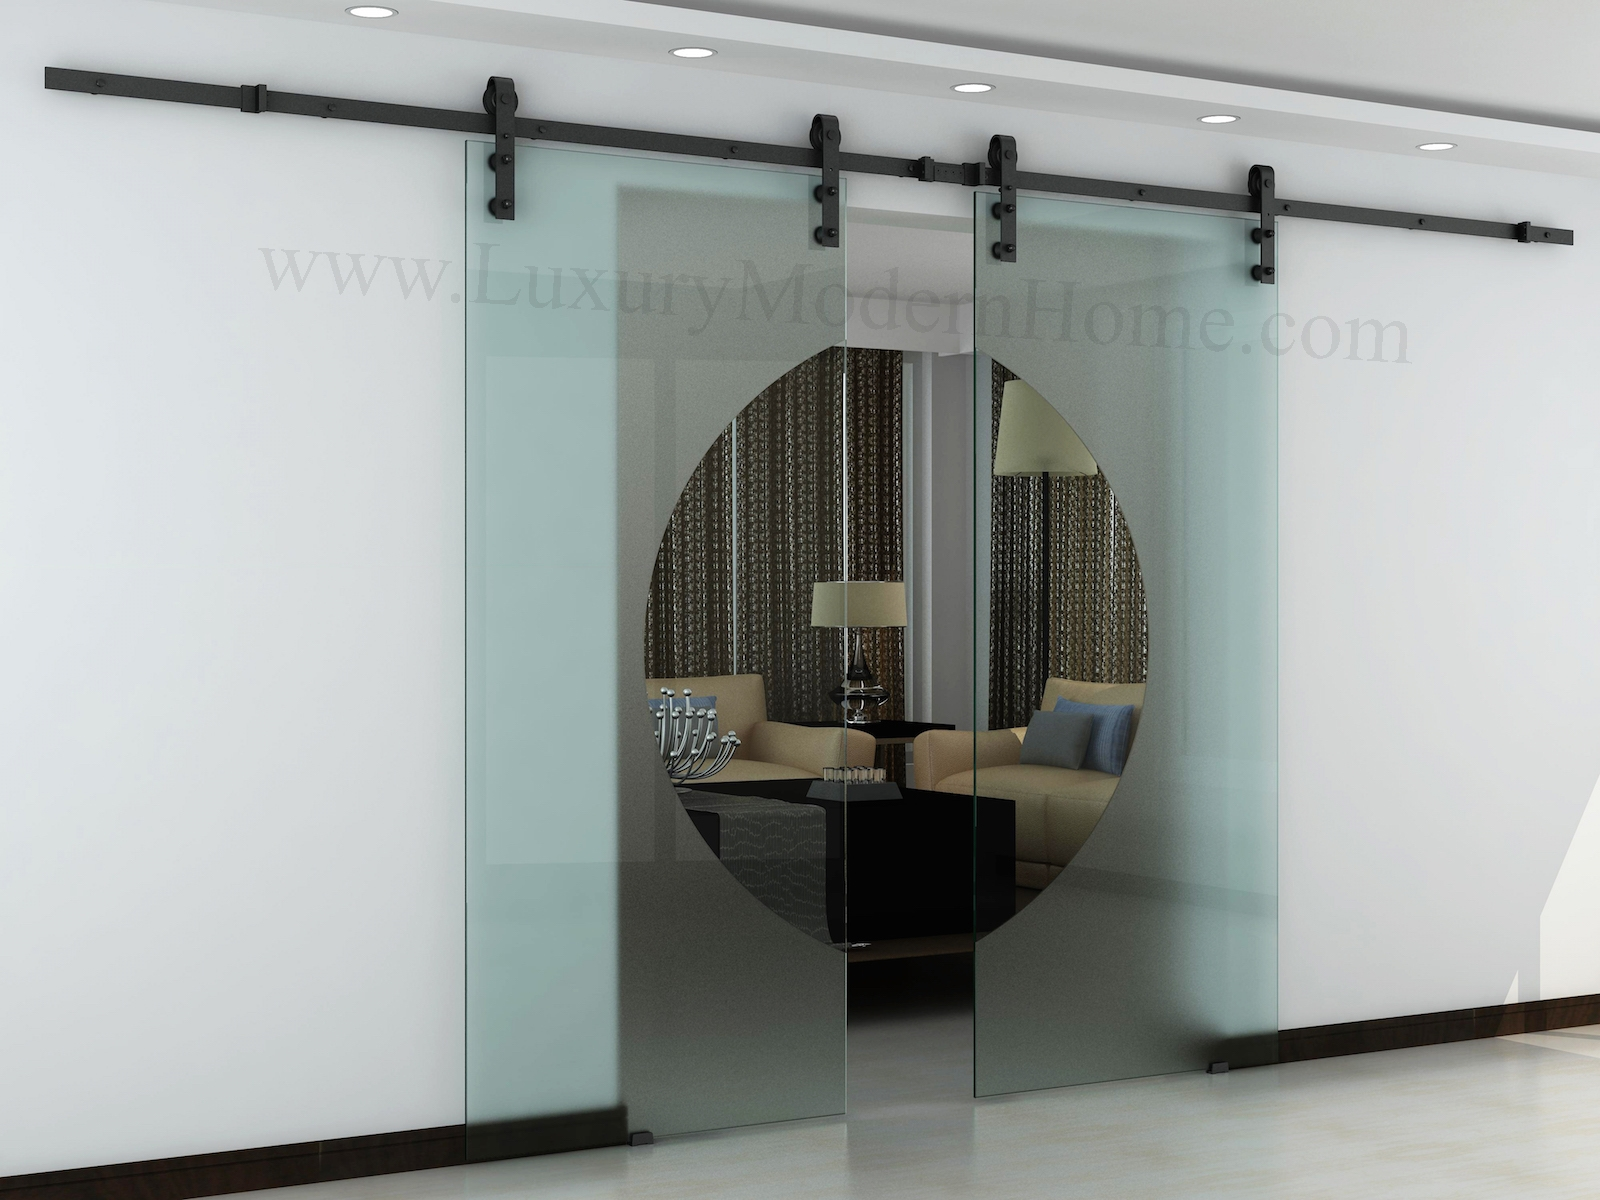 Sliding Barn Doors With Glasssliding barn doors glass aluminum hardware idolza i to design ideas